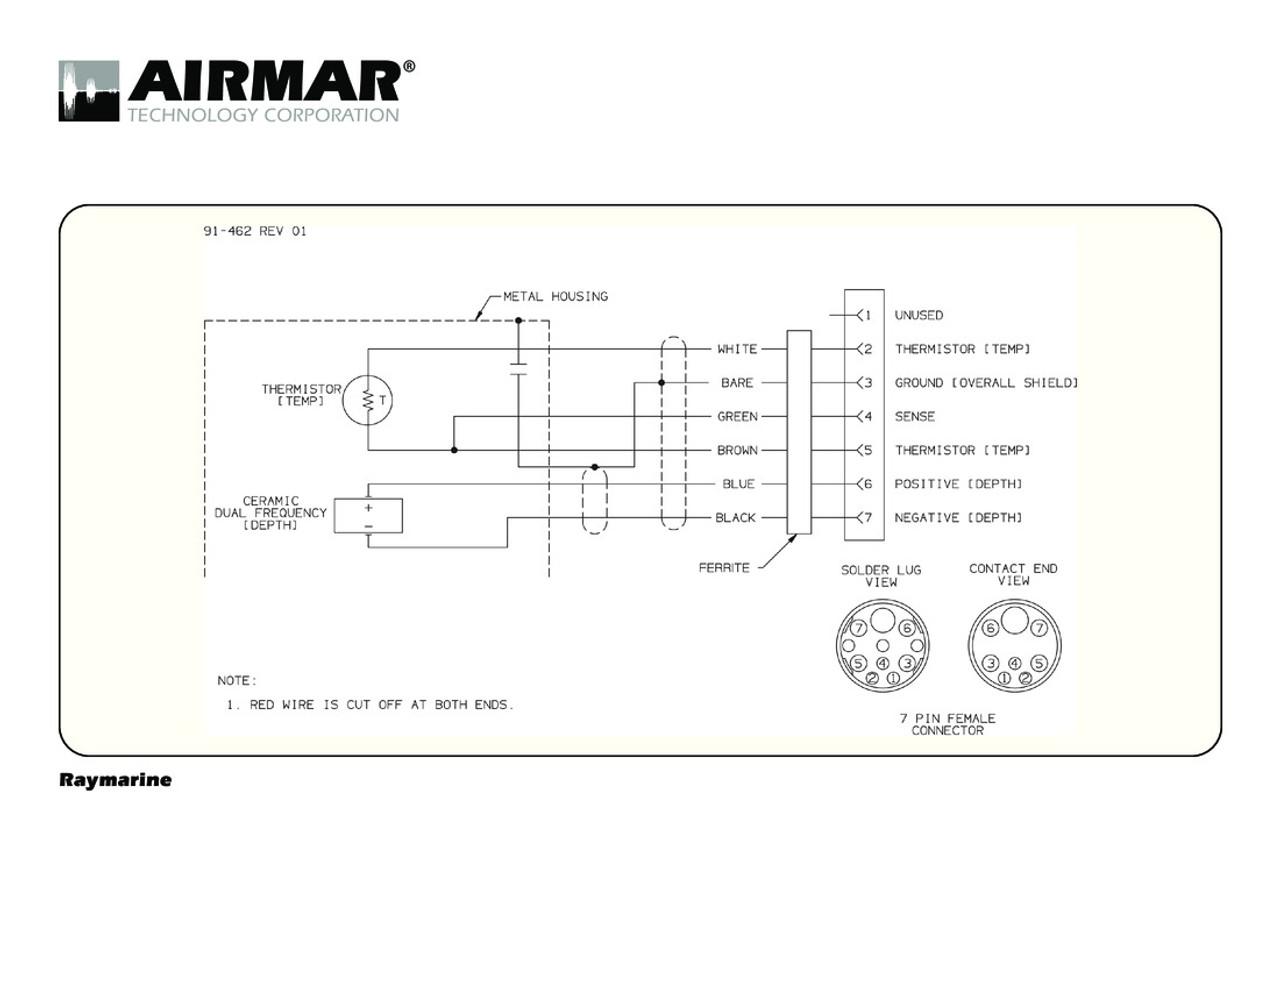 c80 wiring diagram wiring diagrams lol 3-Way Wiring Diagram c80 wiring diagram wiring diagram str wiring a 400 amp service c80 wiring diagram